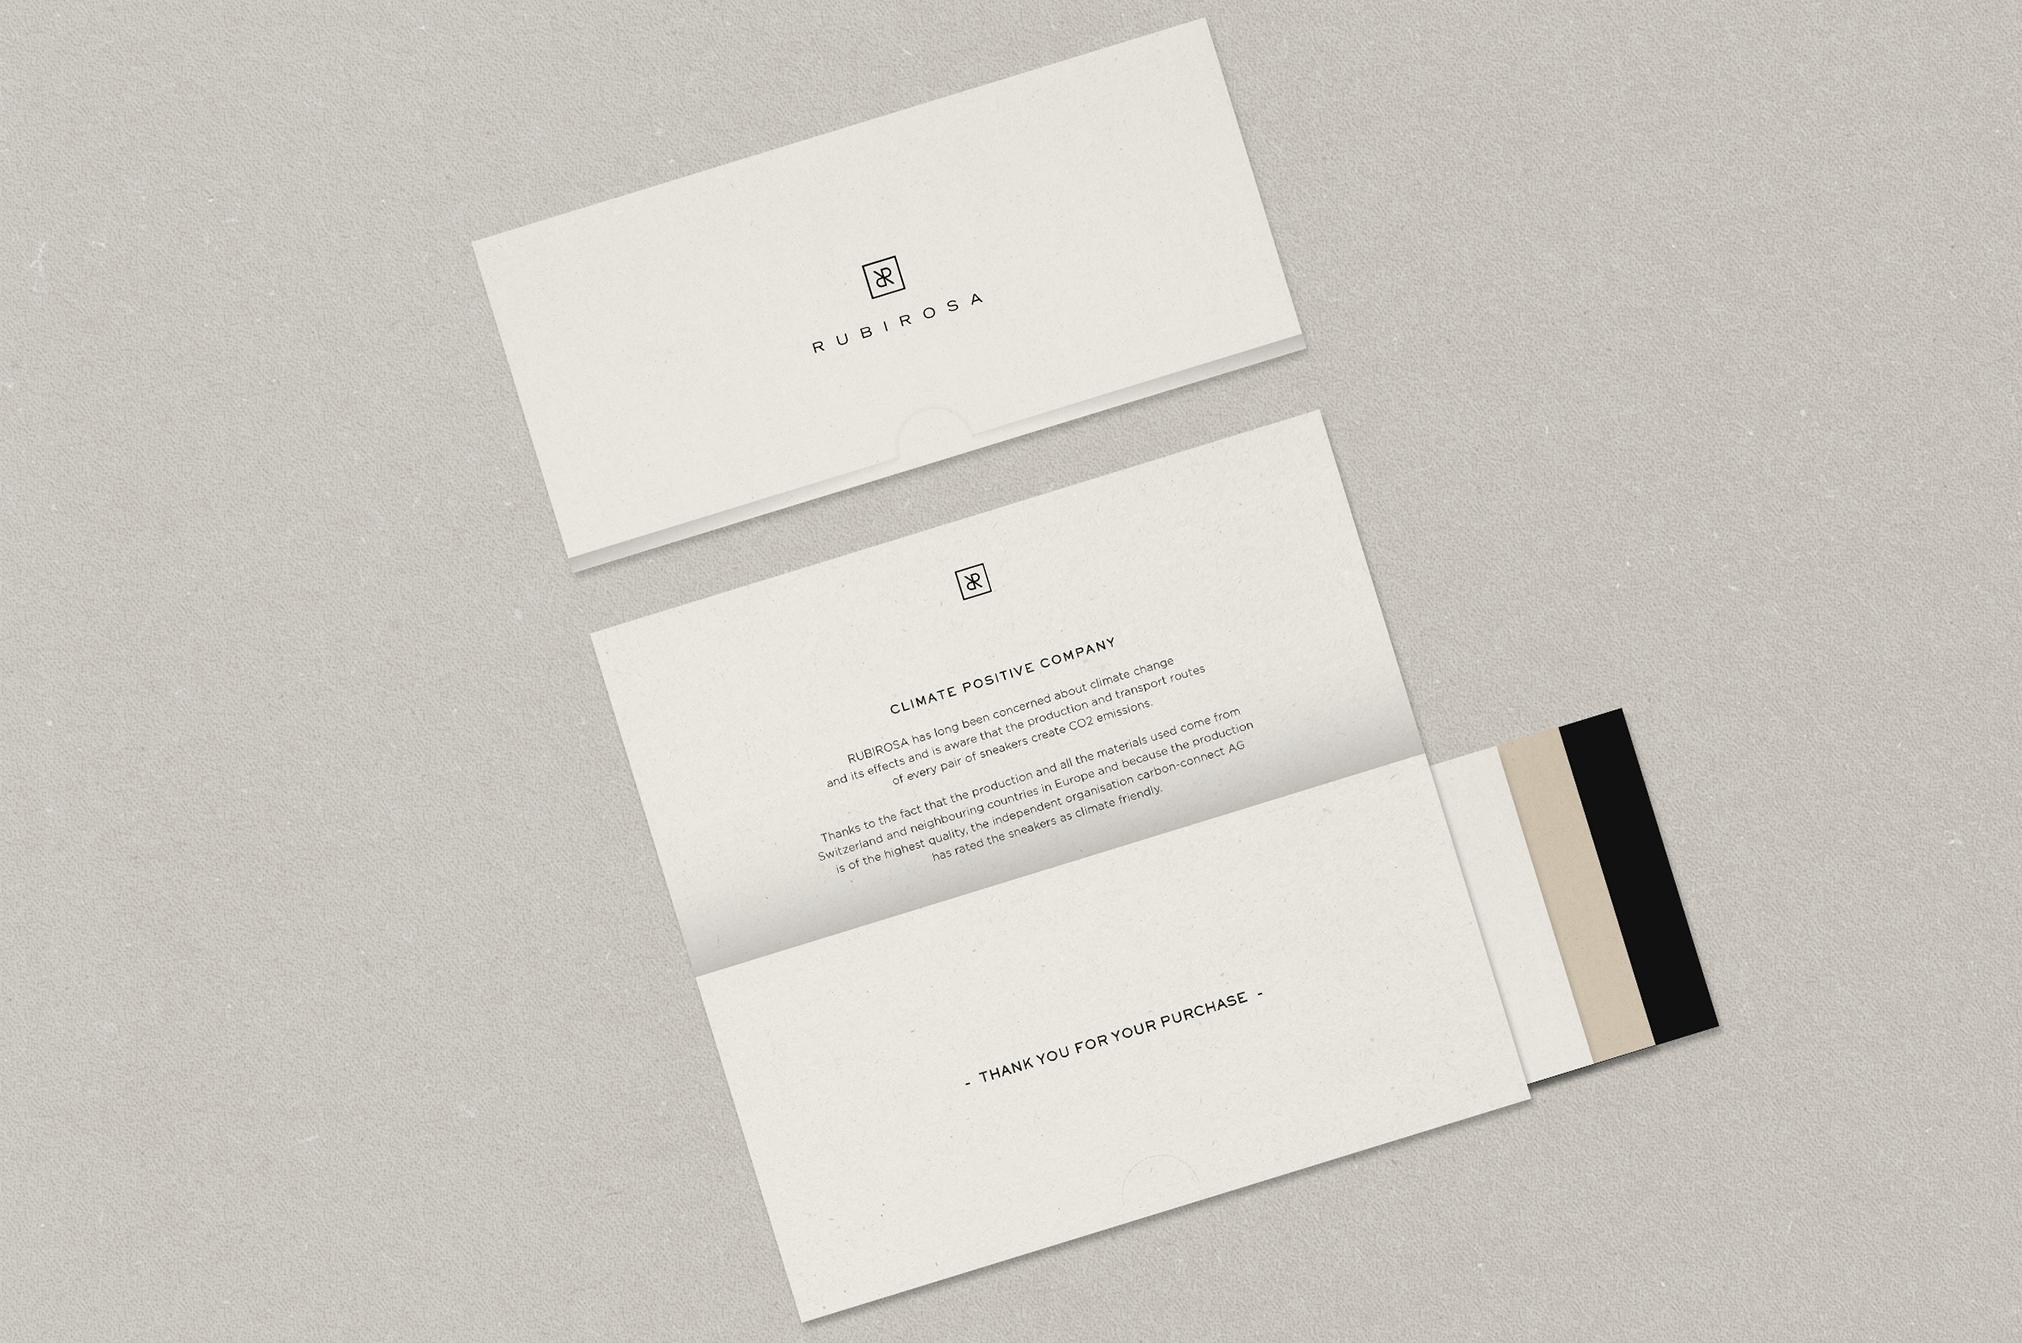 RUBIROSA_mockup-cards_01